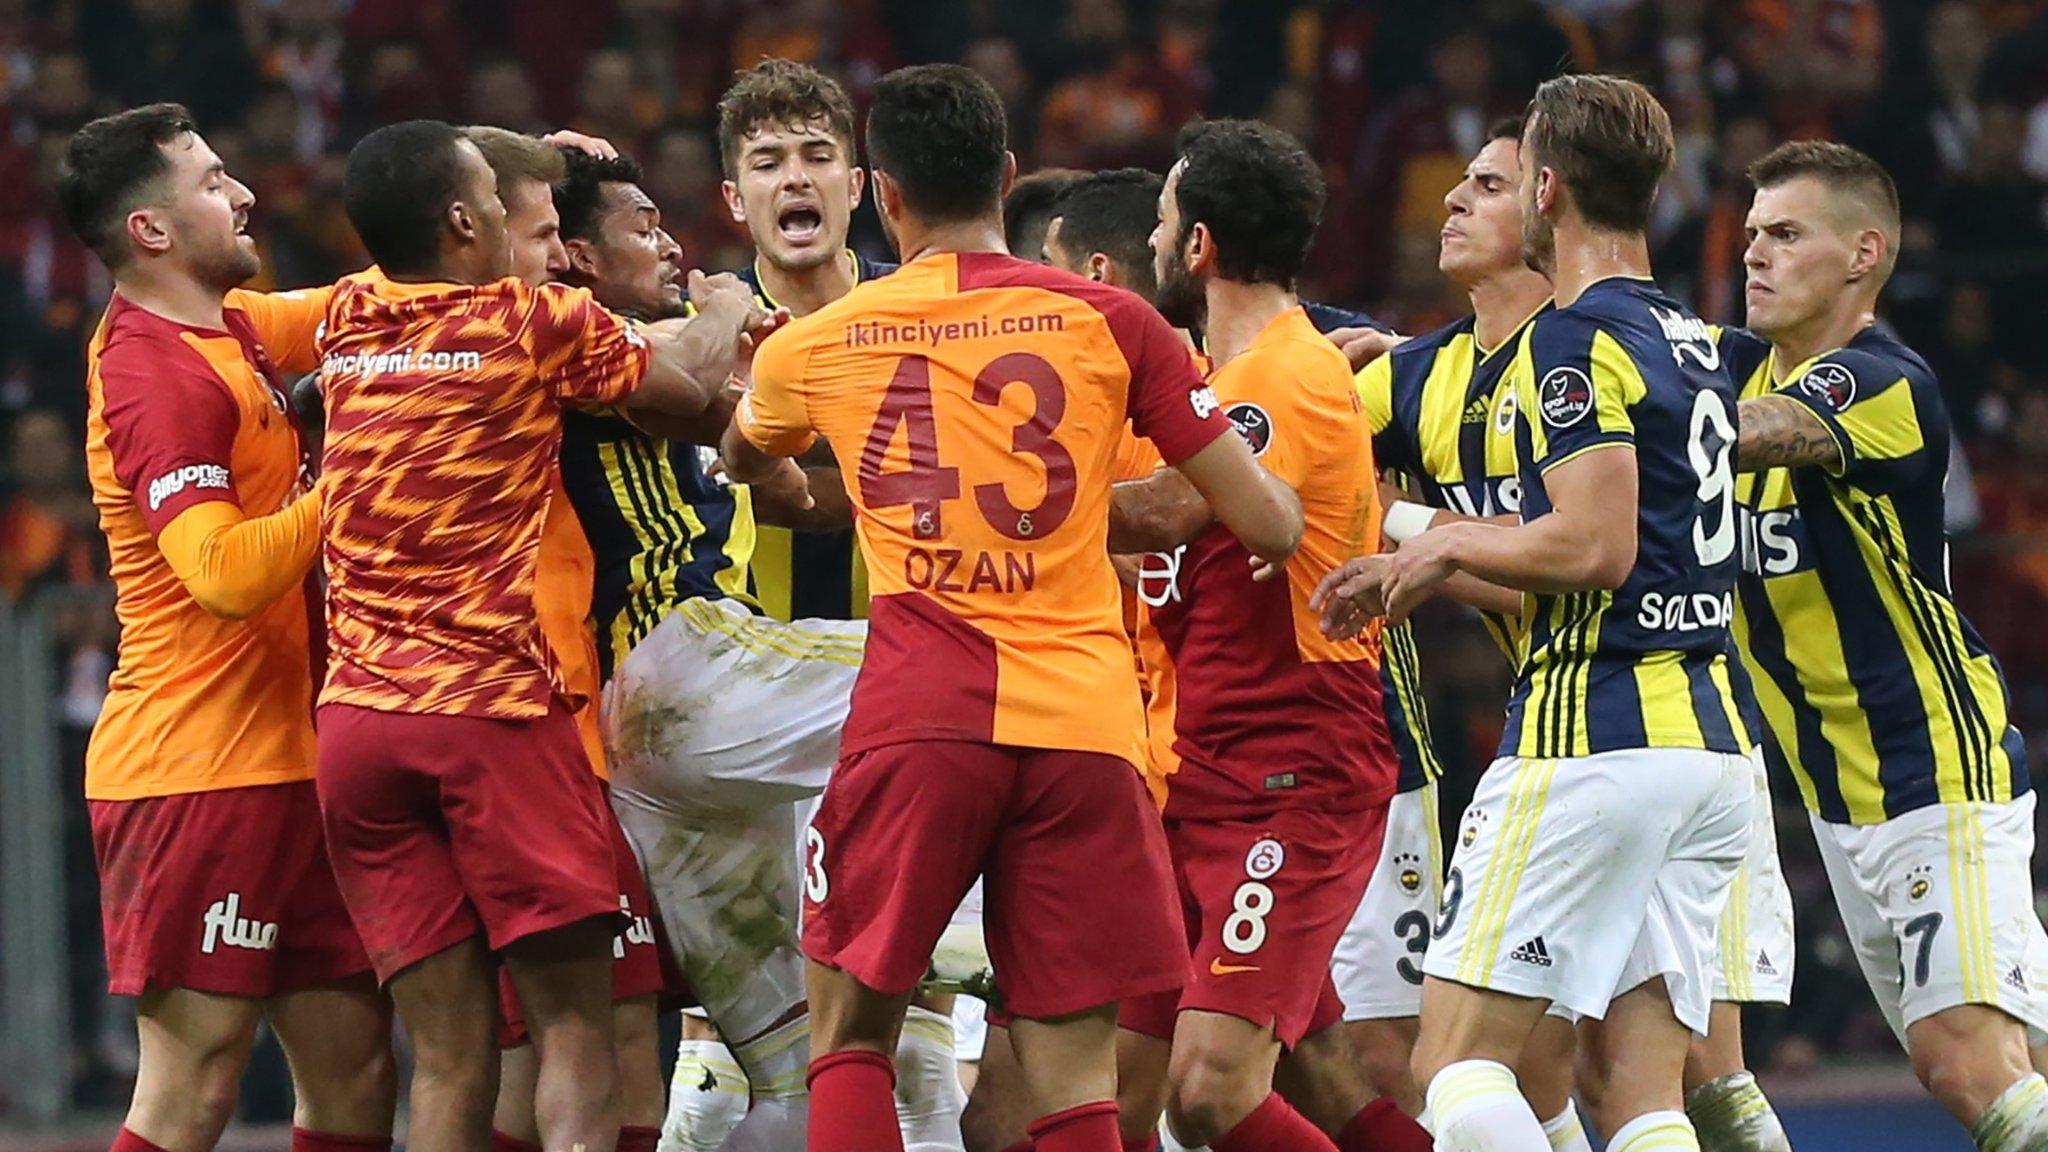 Soldado among seven banned after Galatasaray-Fenerbahce brawl